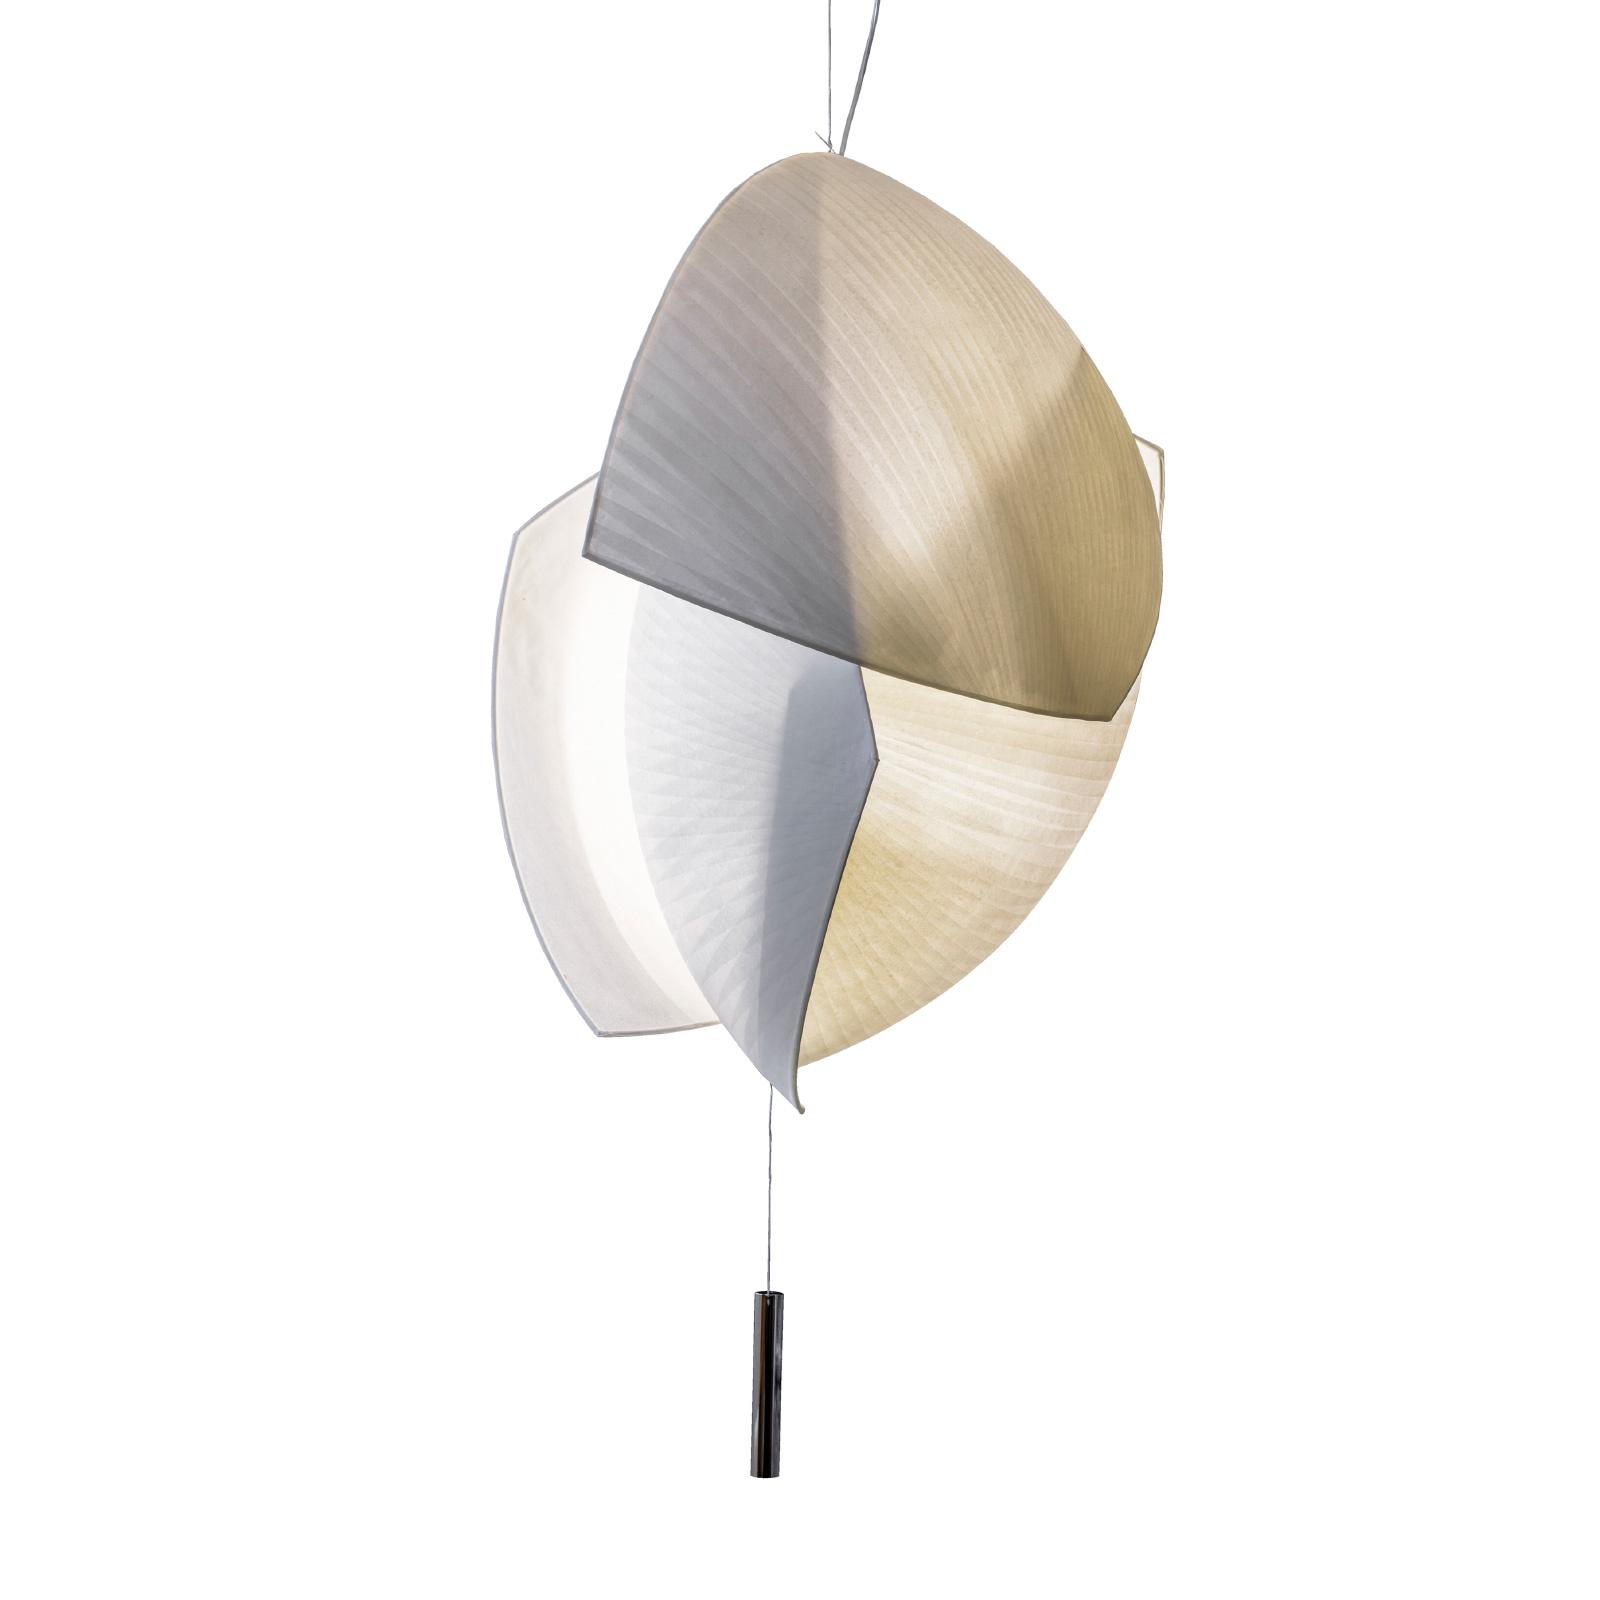 Grok Voiles lampa wisząca LED 95x70 cm, DALI